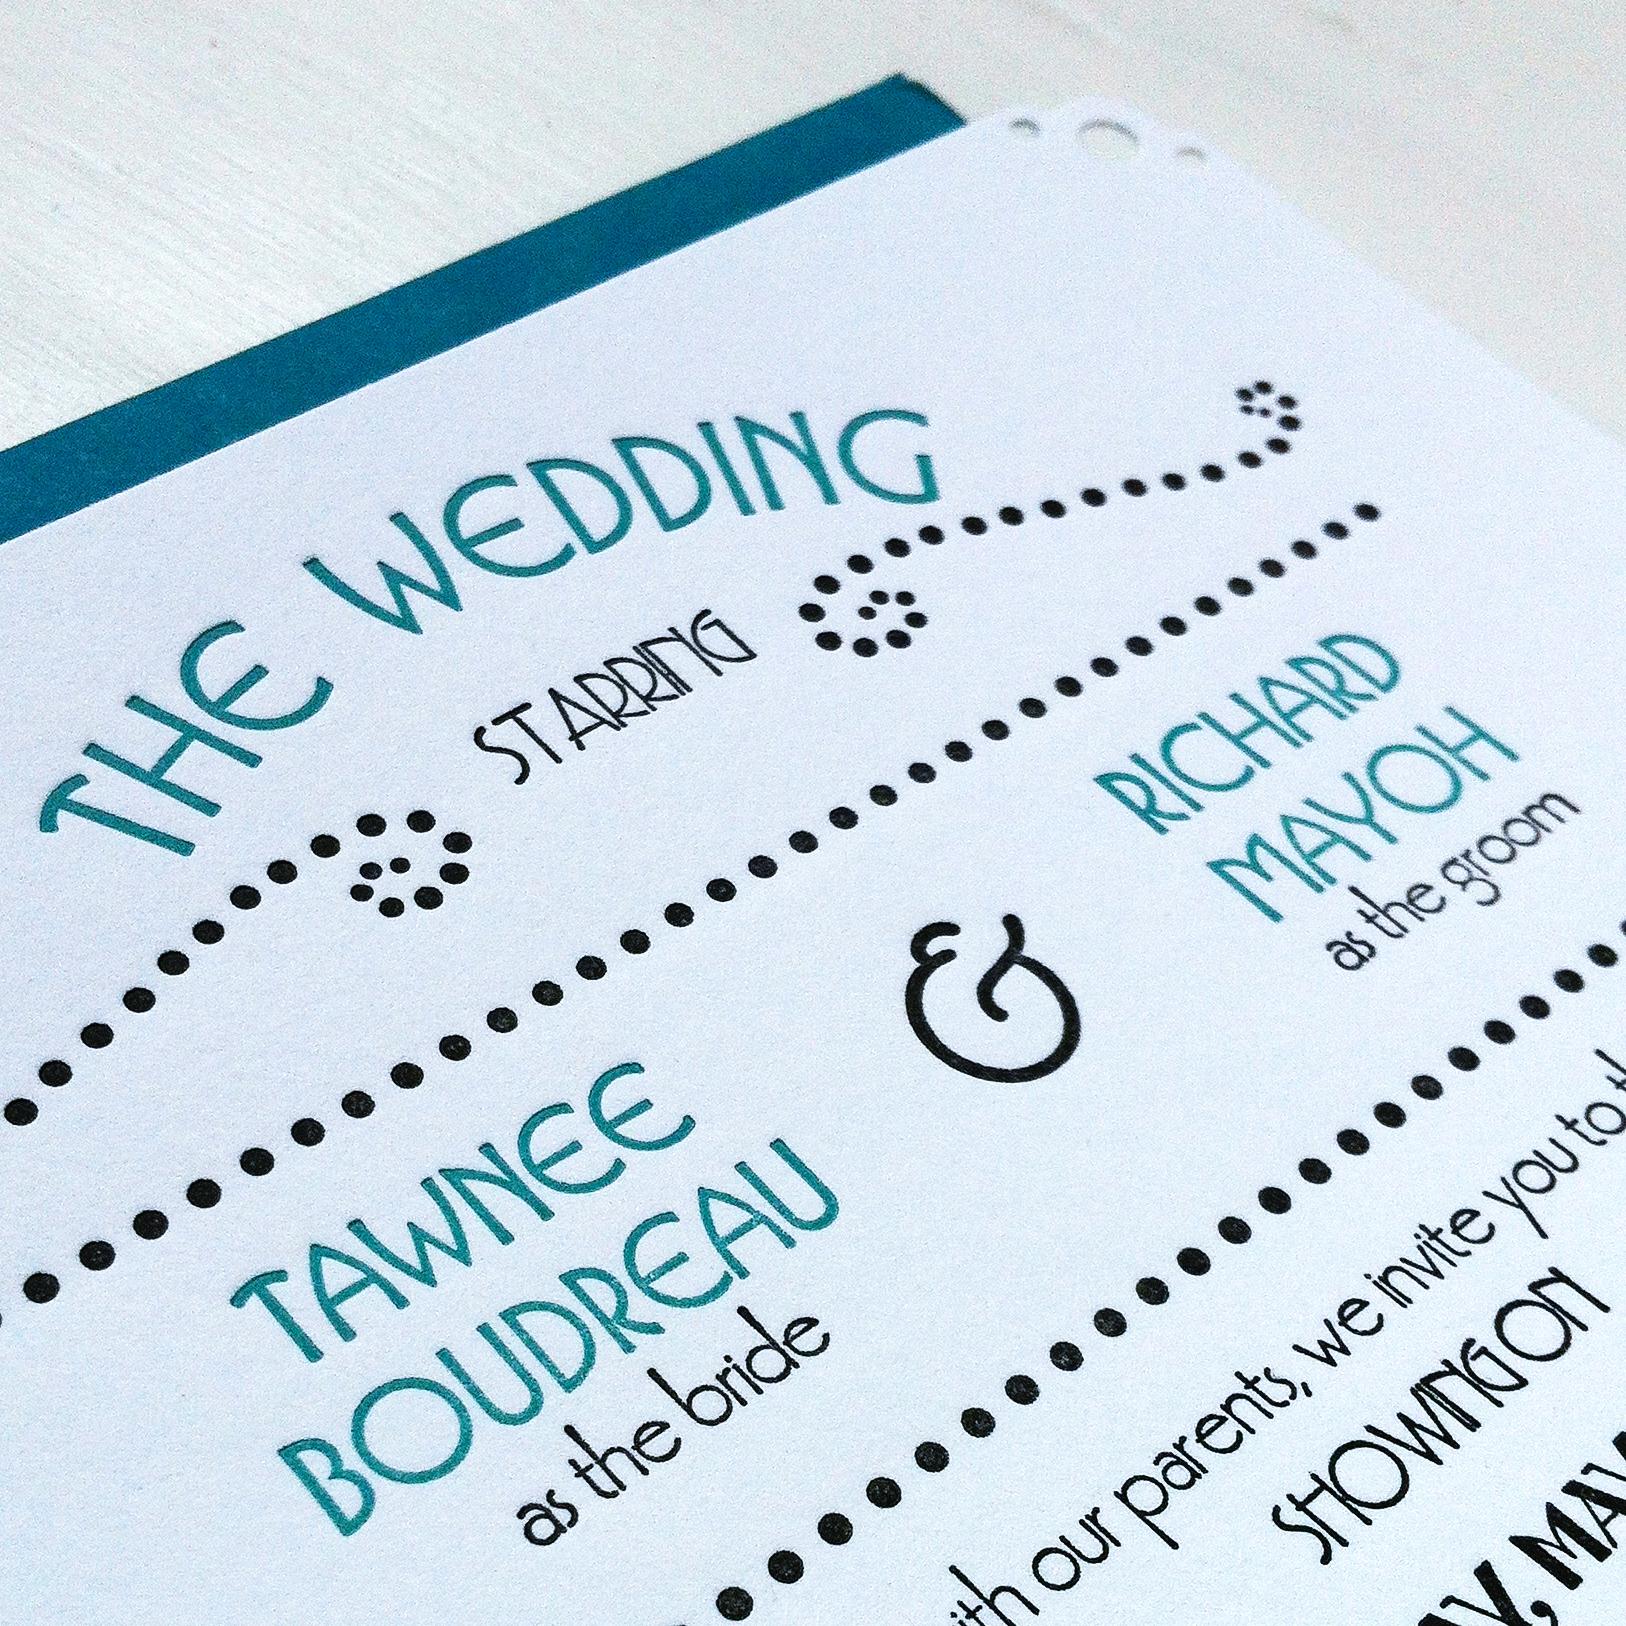 teal_black_wedding_invitation_letterpress.jpg